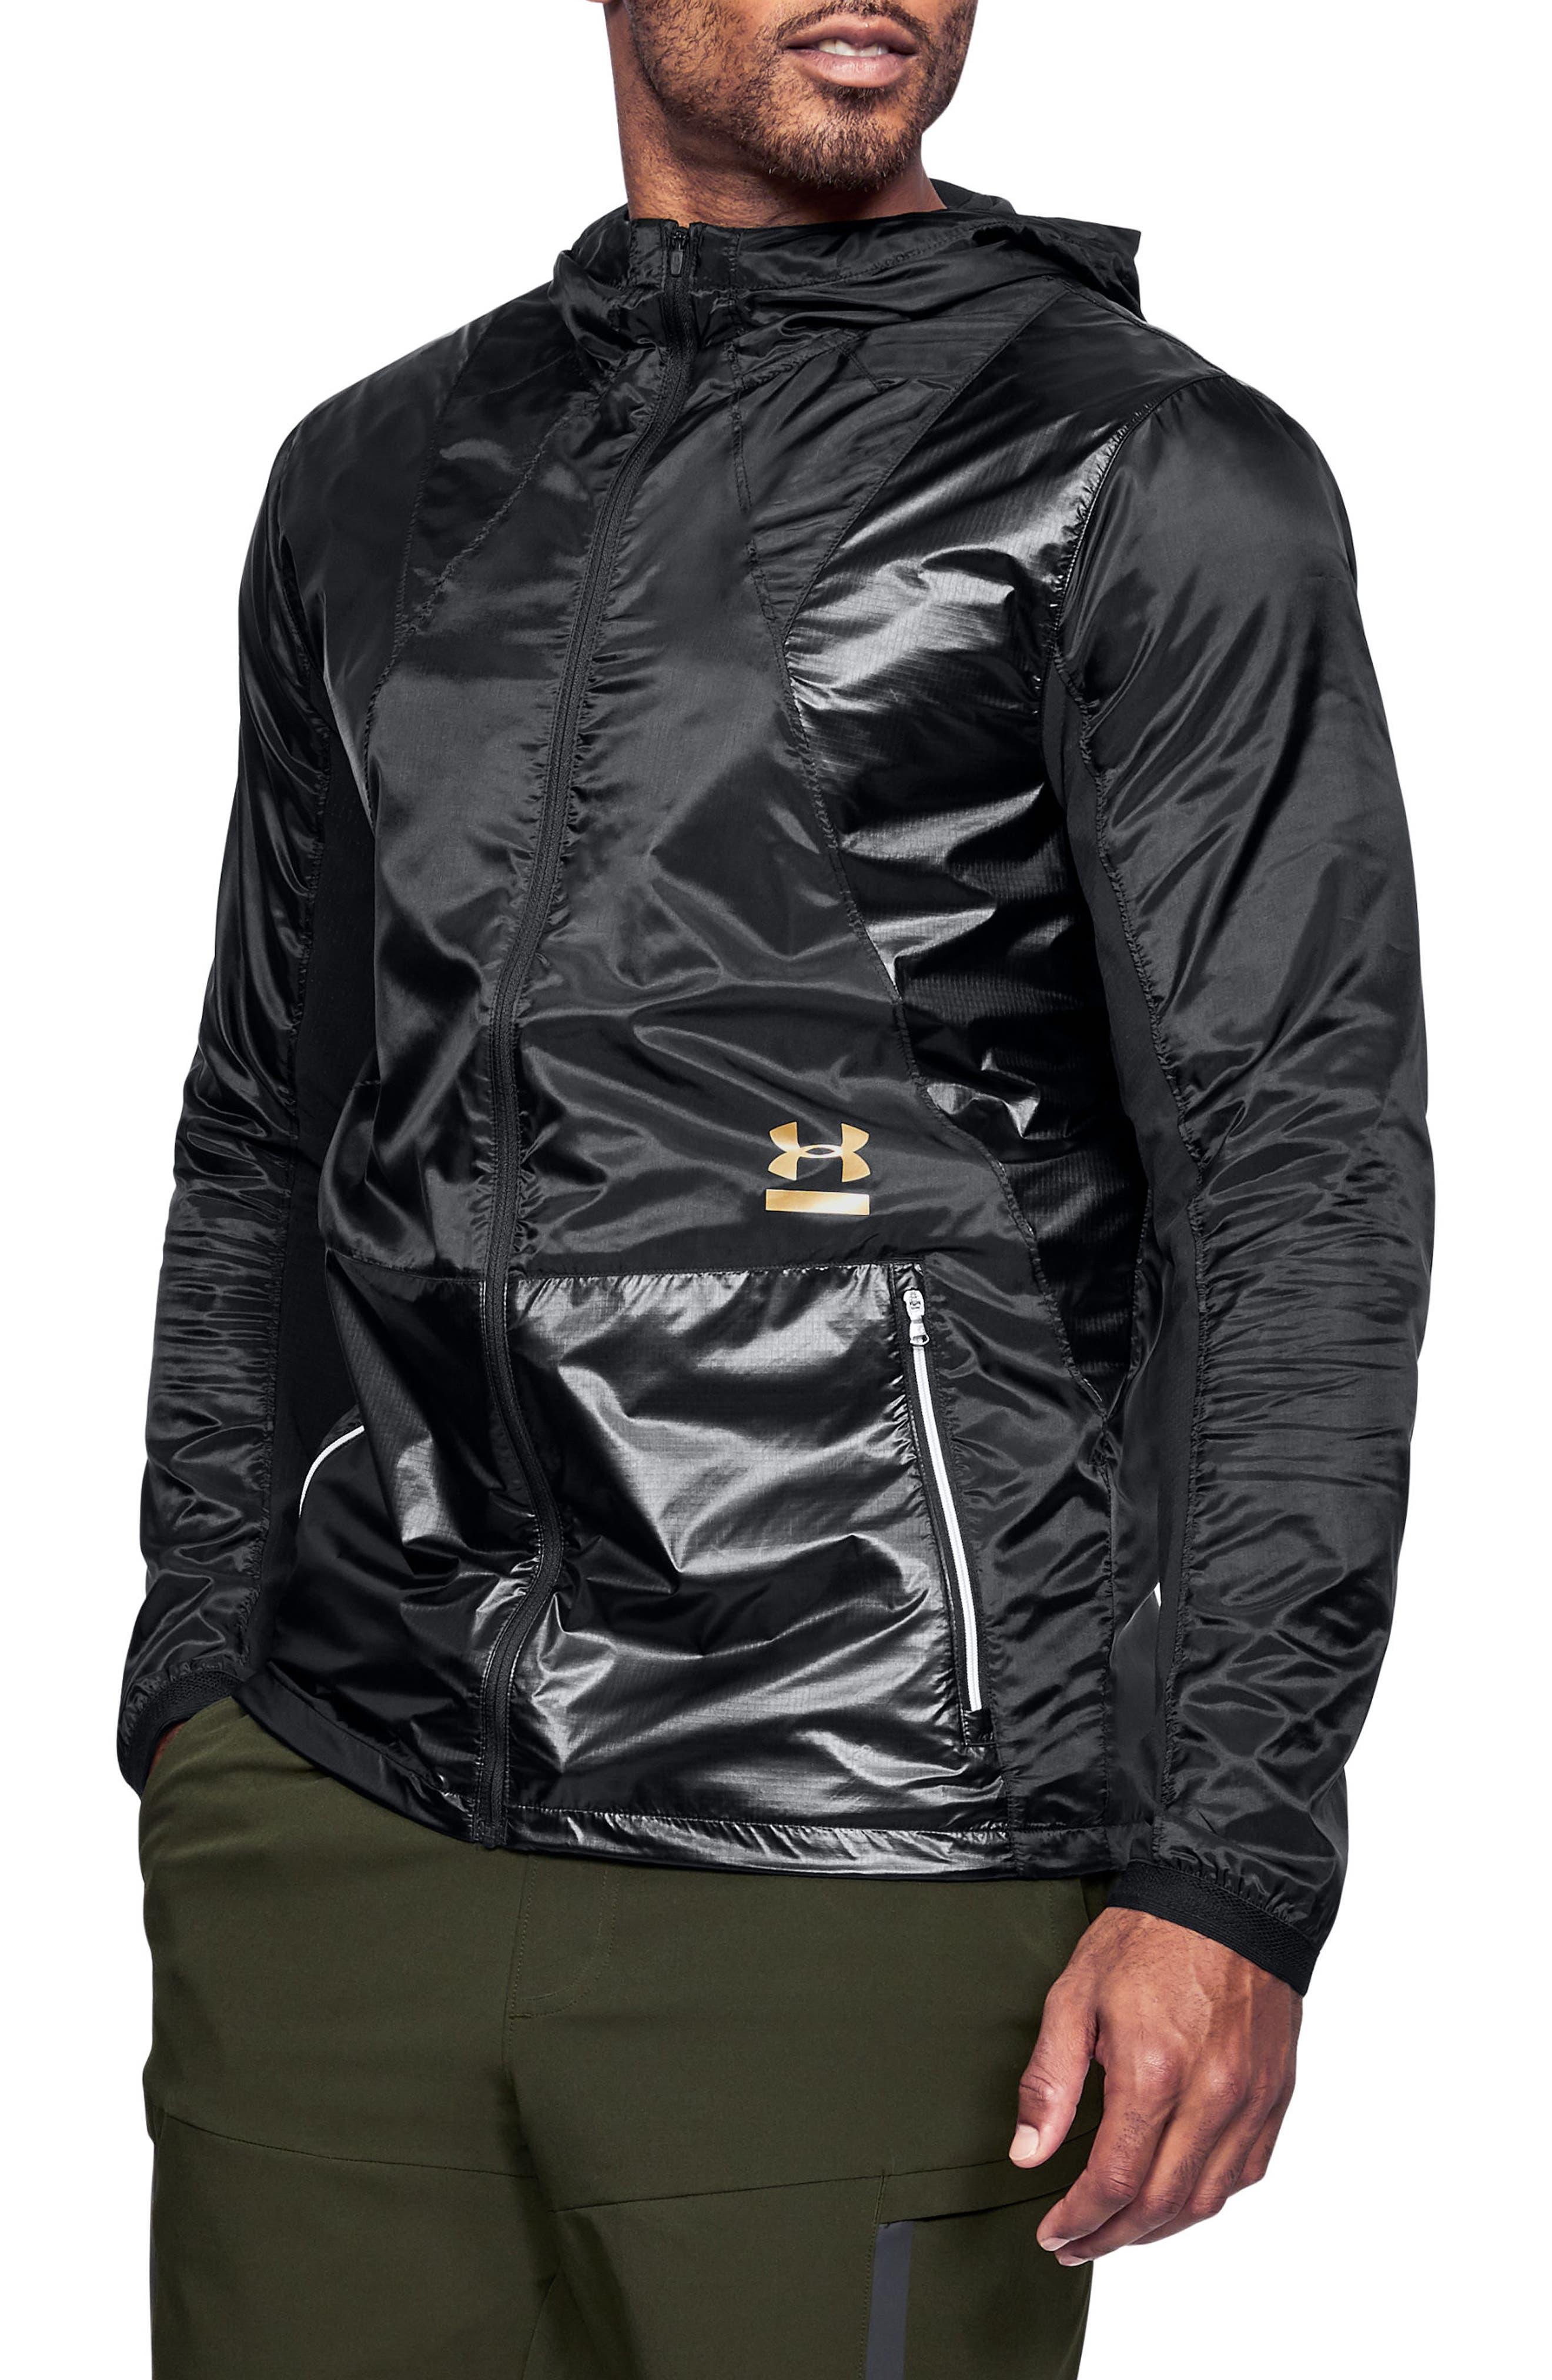 Perpetual Windproof & Water Resistant Hooded Jacket,                         Main,                         color, Black/ Metallic Victory Gold